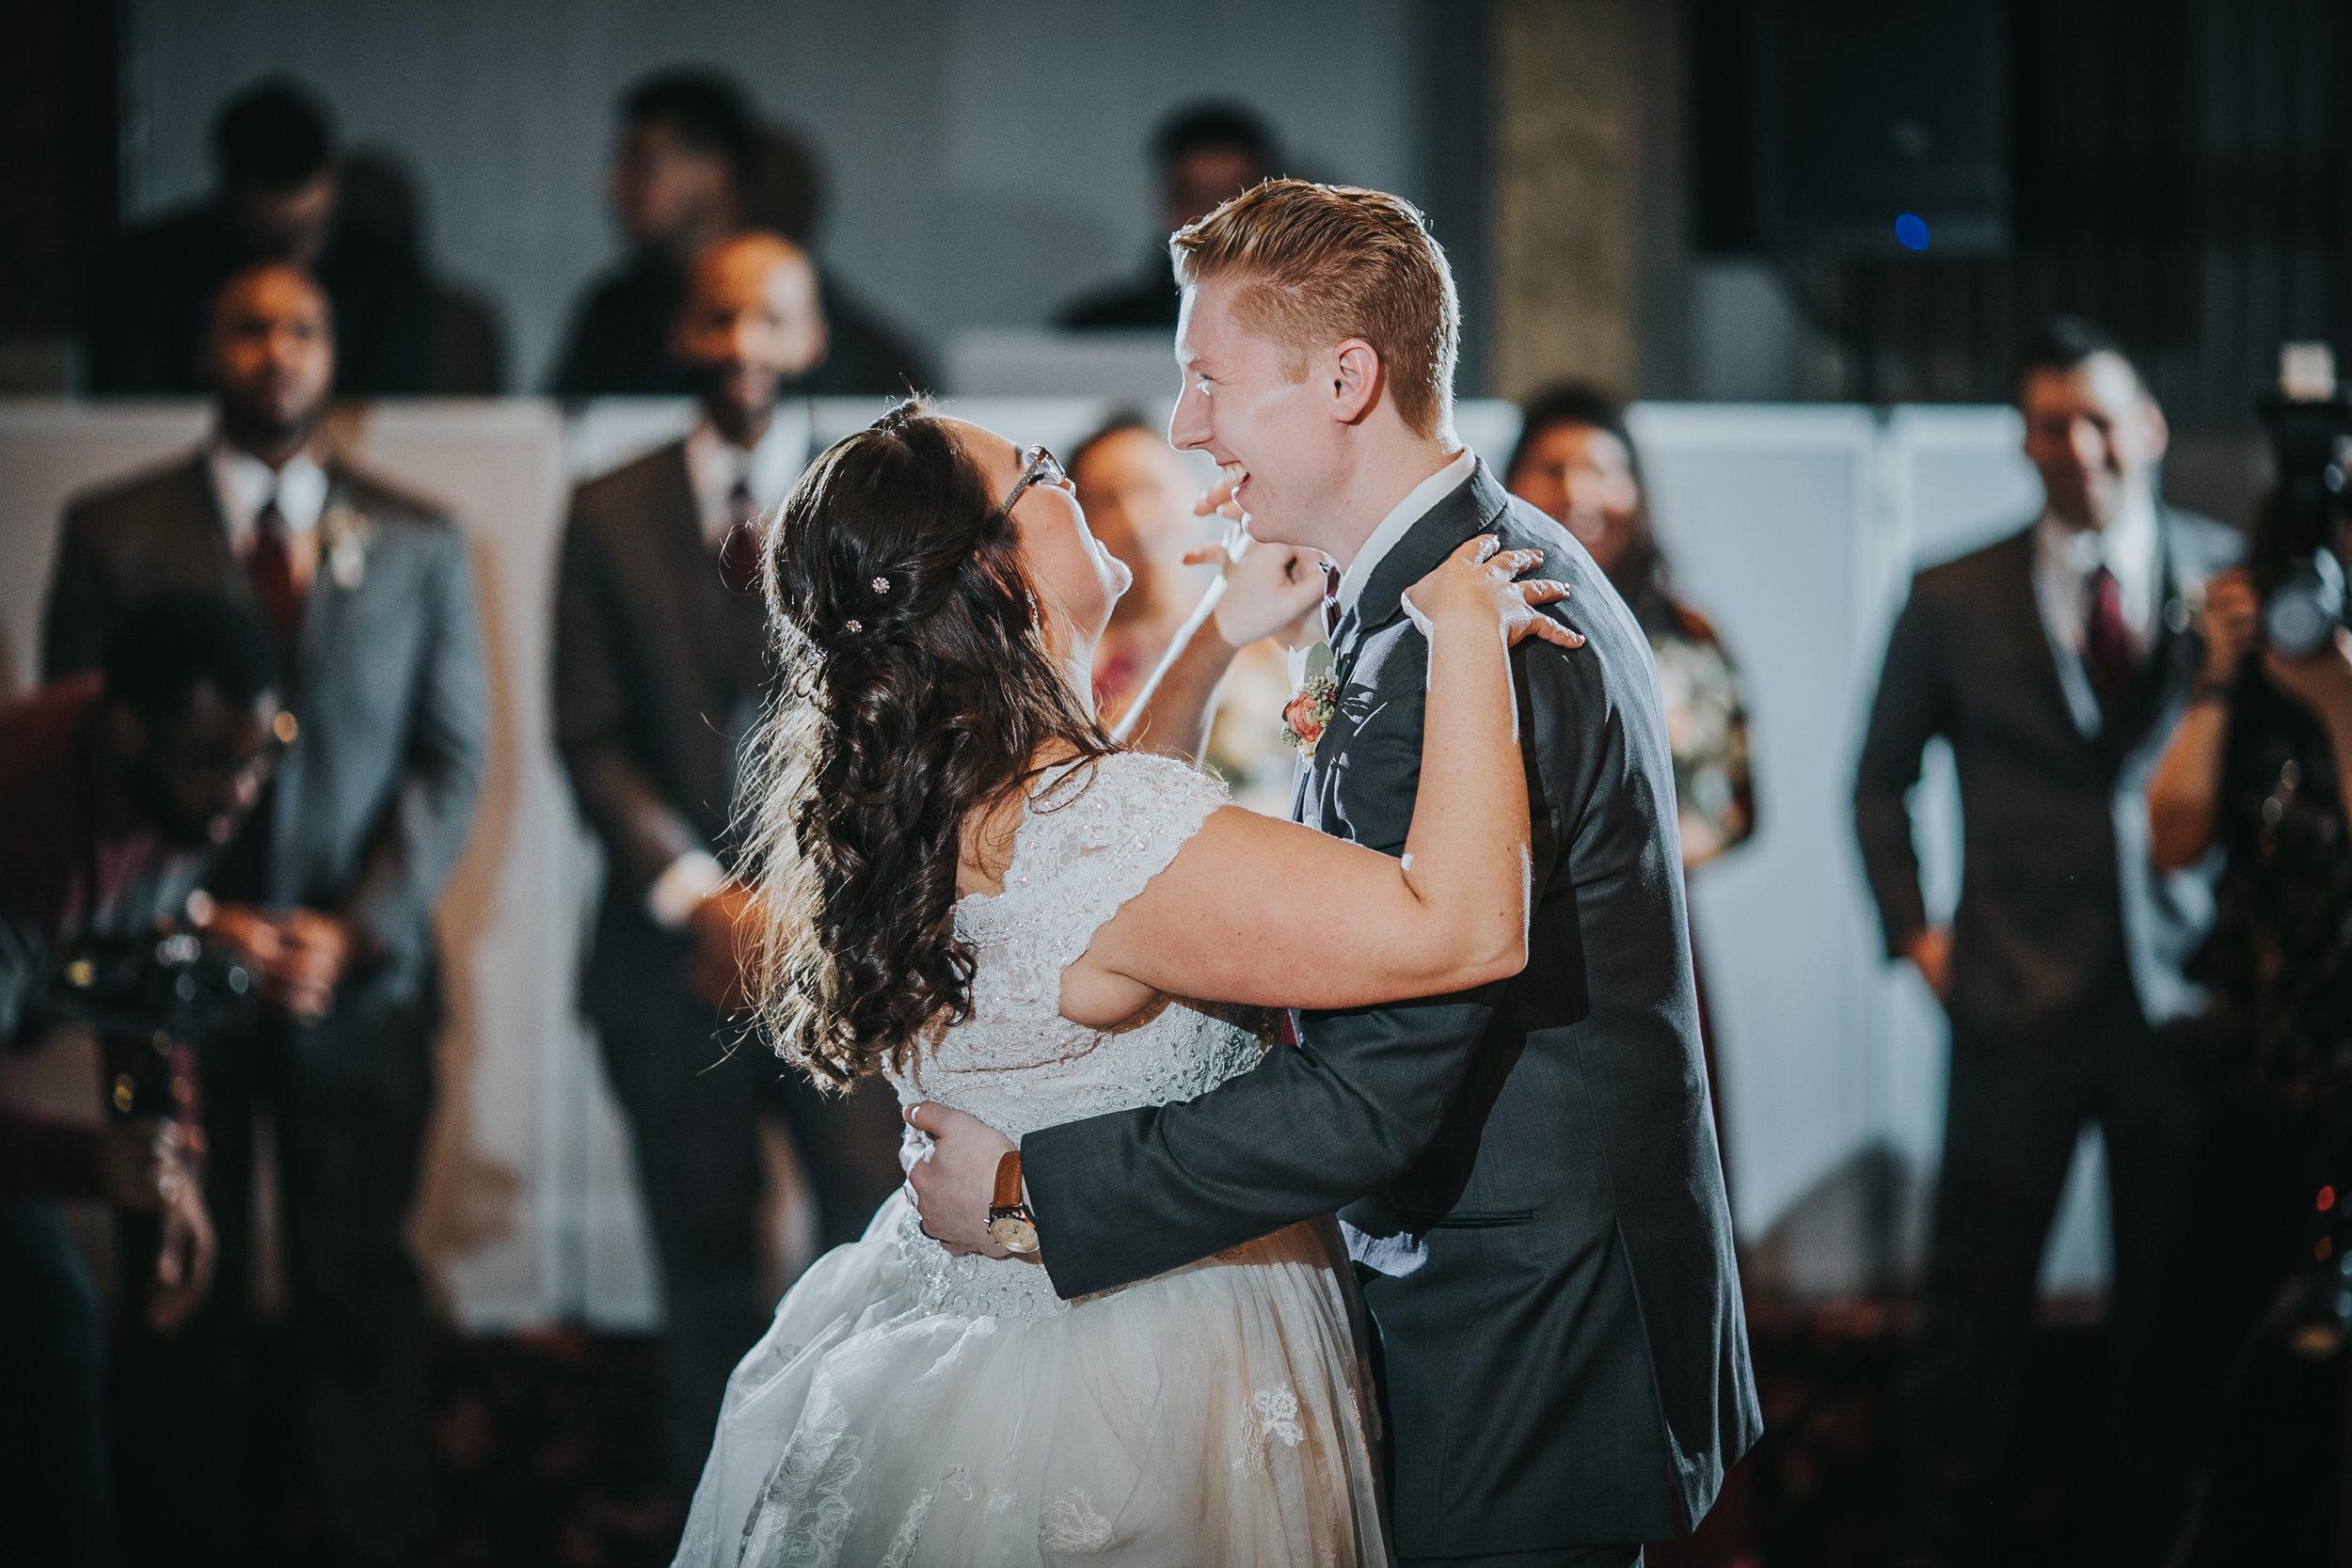 New-Jersey-Wedding-Photography-Fishers-Tudor-House-JennaLynnPhotography-Reception-Kathleen&Eddie-92.jpg